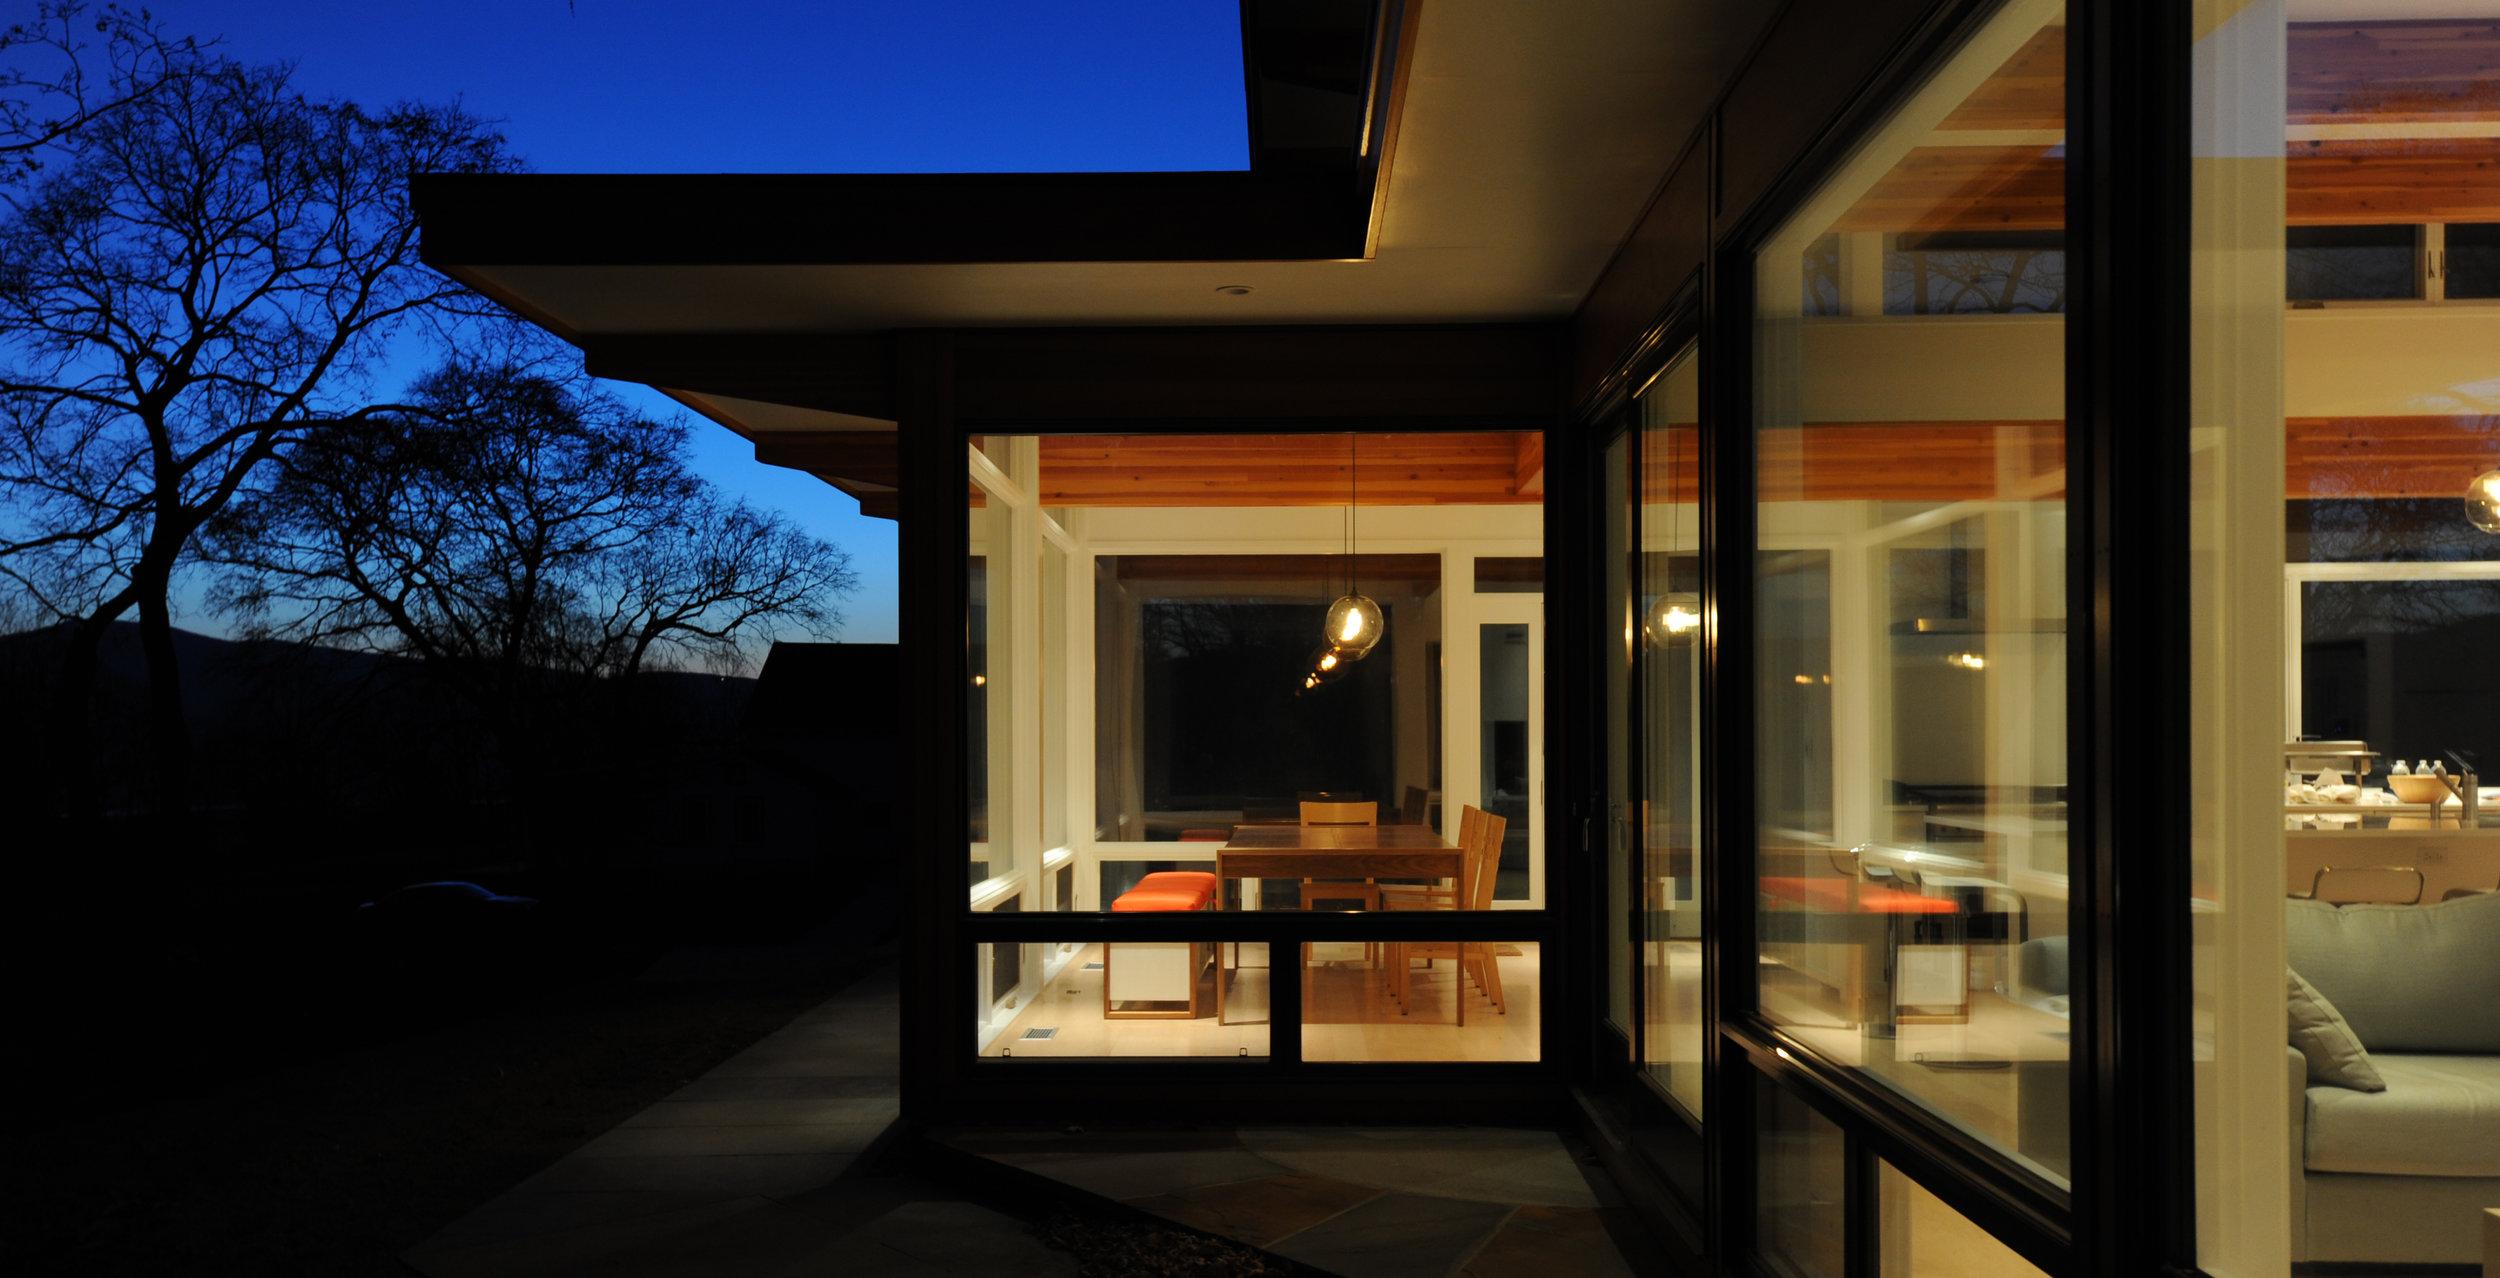 turkel_modern_design_prefab_home_reservoir_shokan_NY_windows_diningroom.jpg